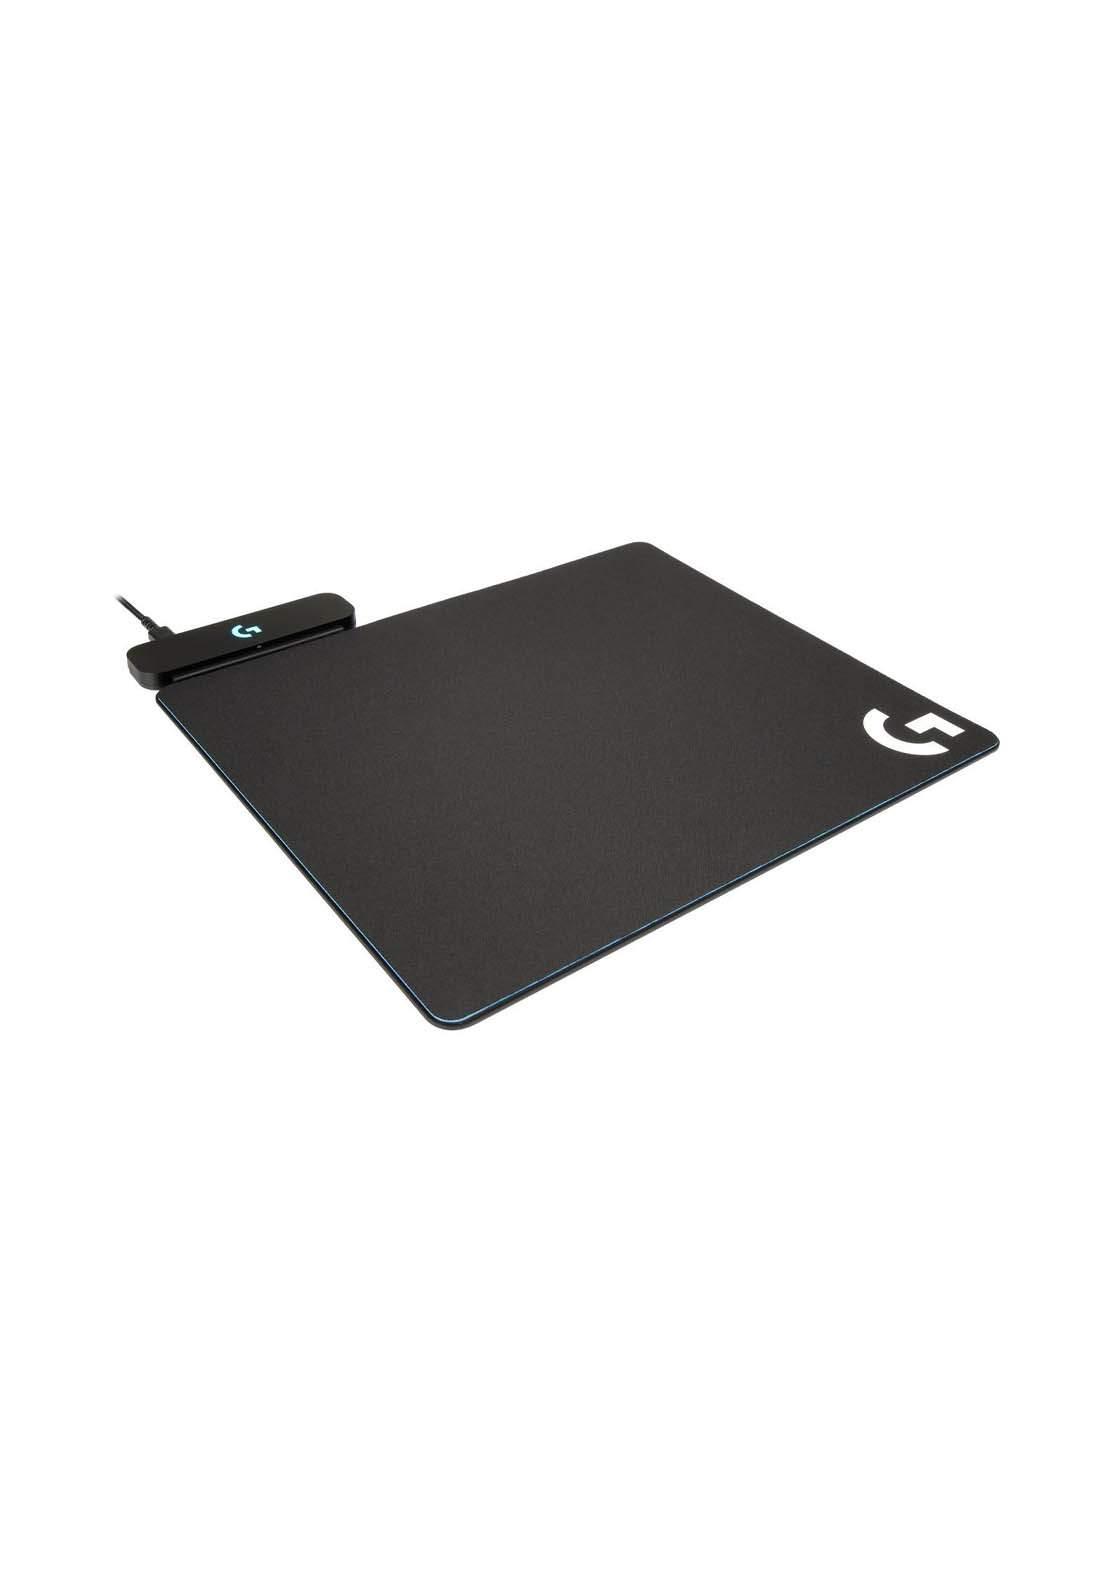 Logitech G Powerplay Wireless Charging System for G703, G903, G502 Lightspeed Wireless Gaming Mice - Black لوحة ماوس